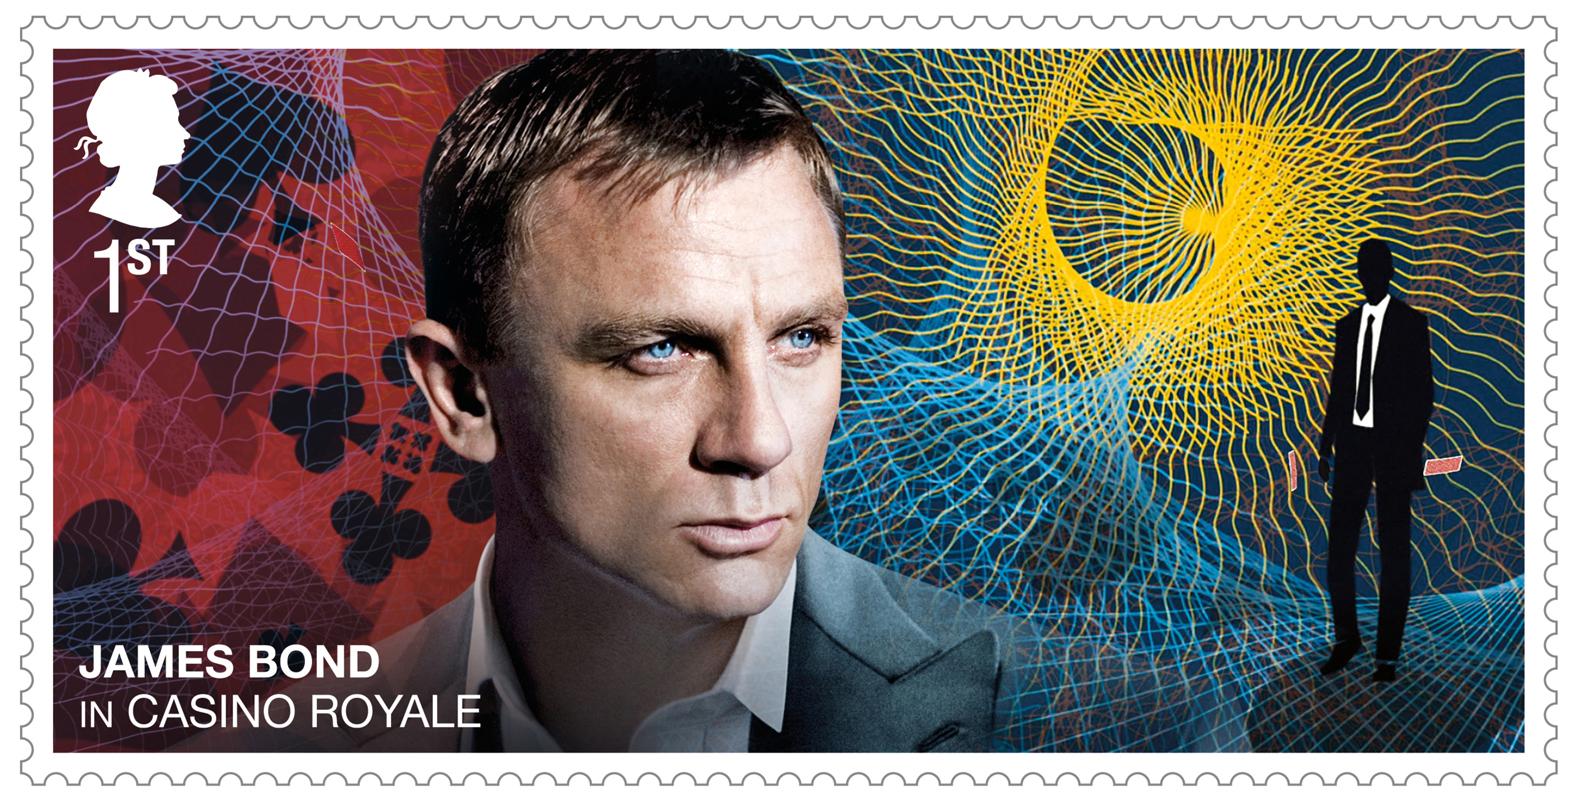 The stamp of Bond